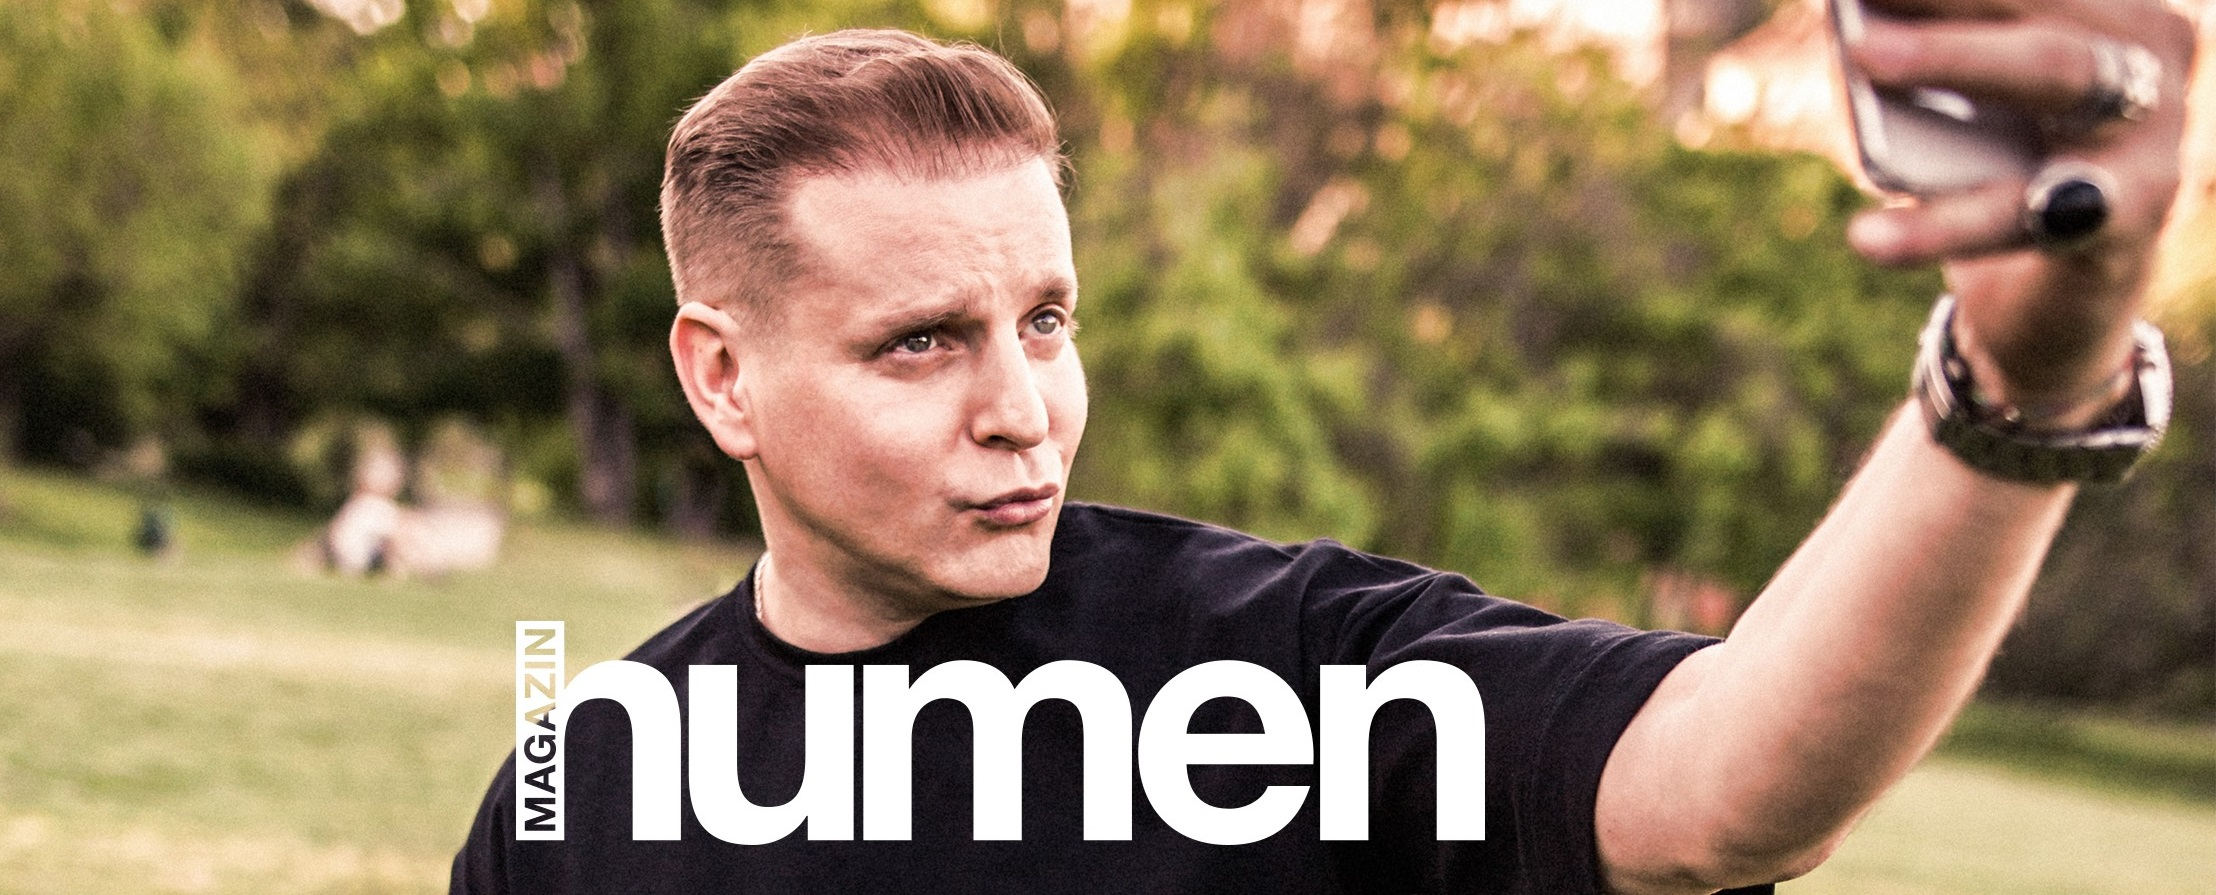 Humen Magazin 2019. 01. (február) by Humen Magazin issuu